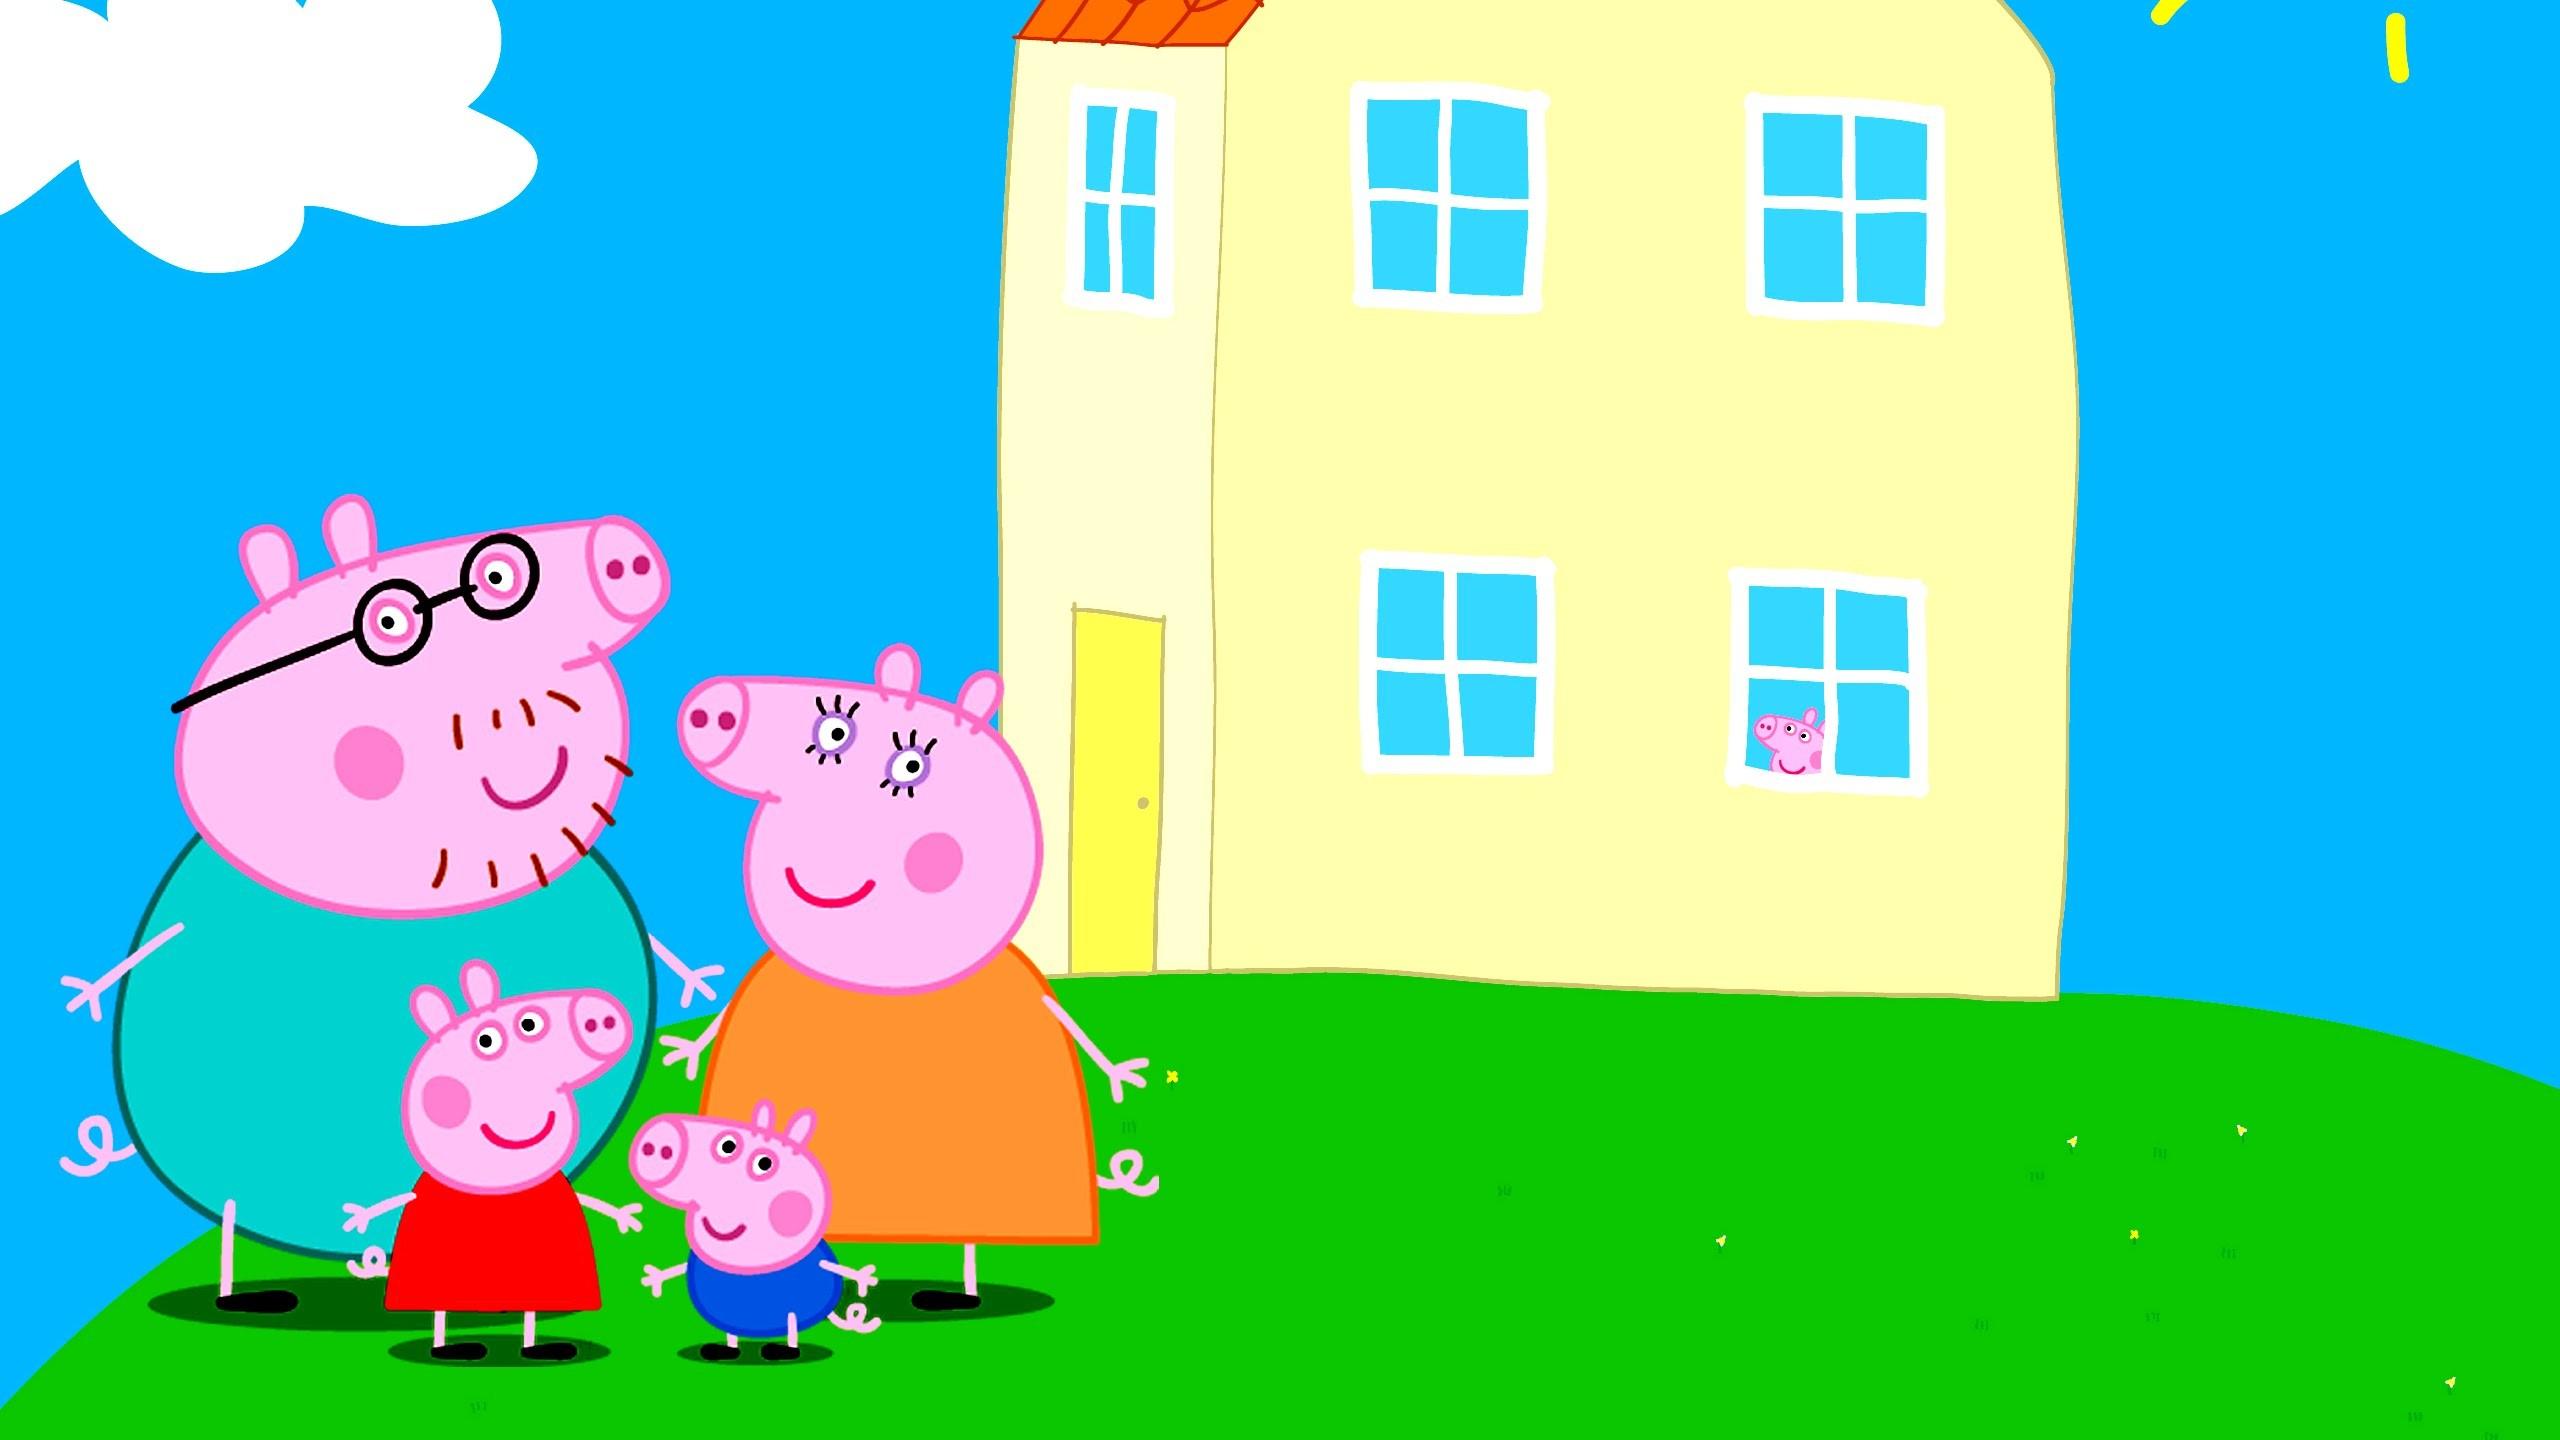 Peppa Pig Wallpaper Peppa Pig House Wallpaper